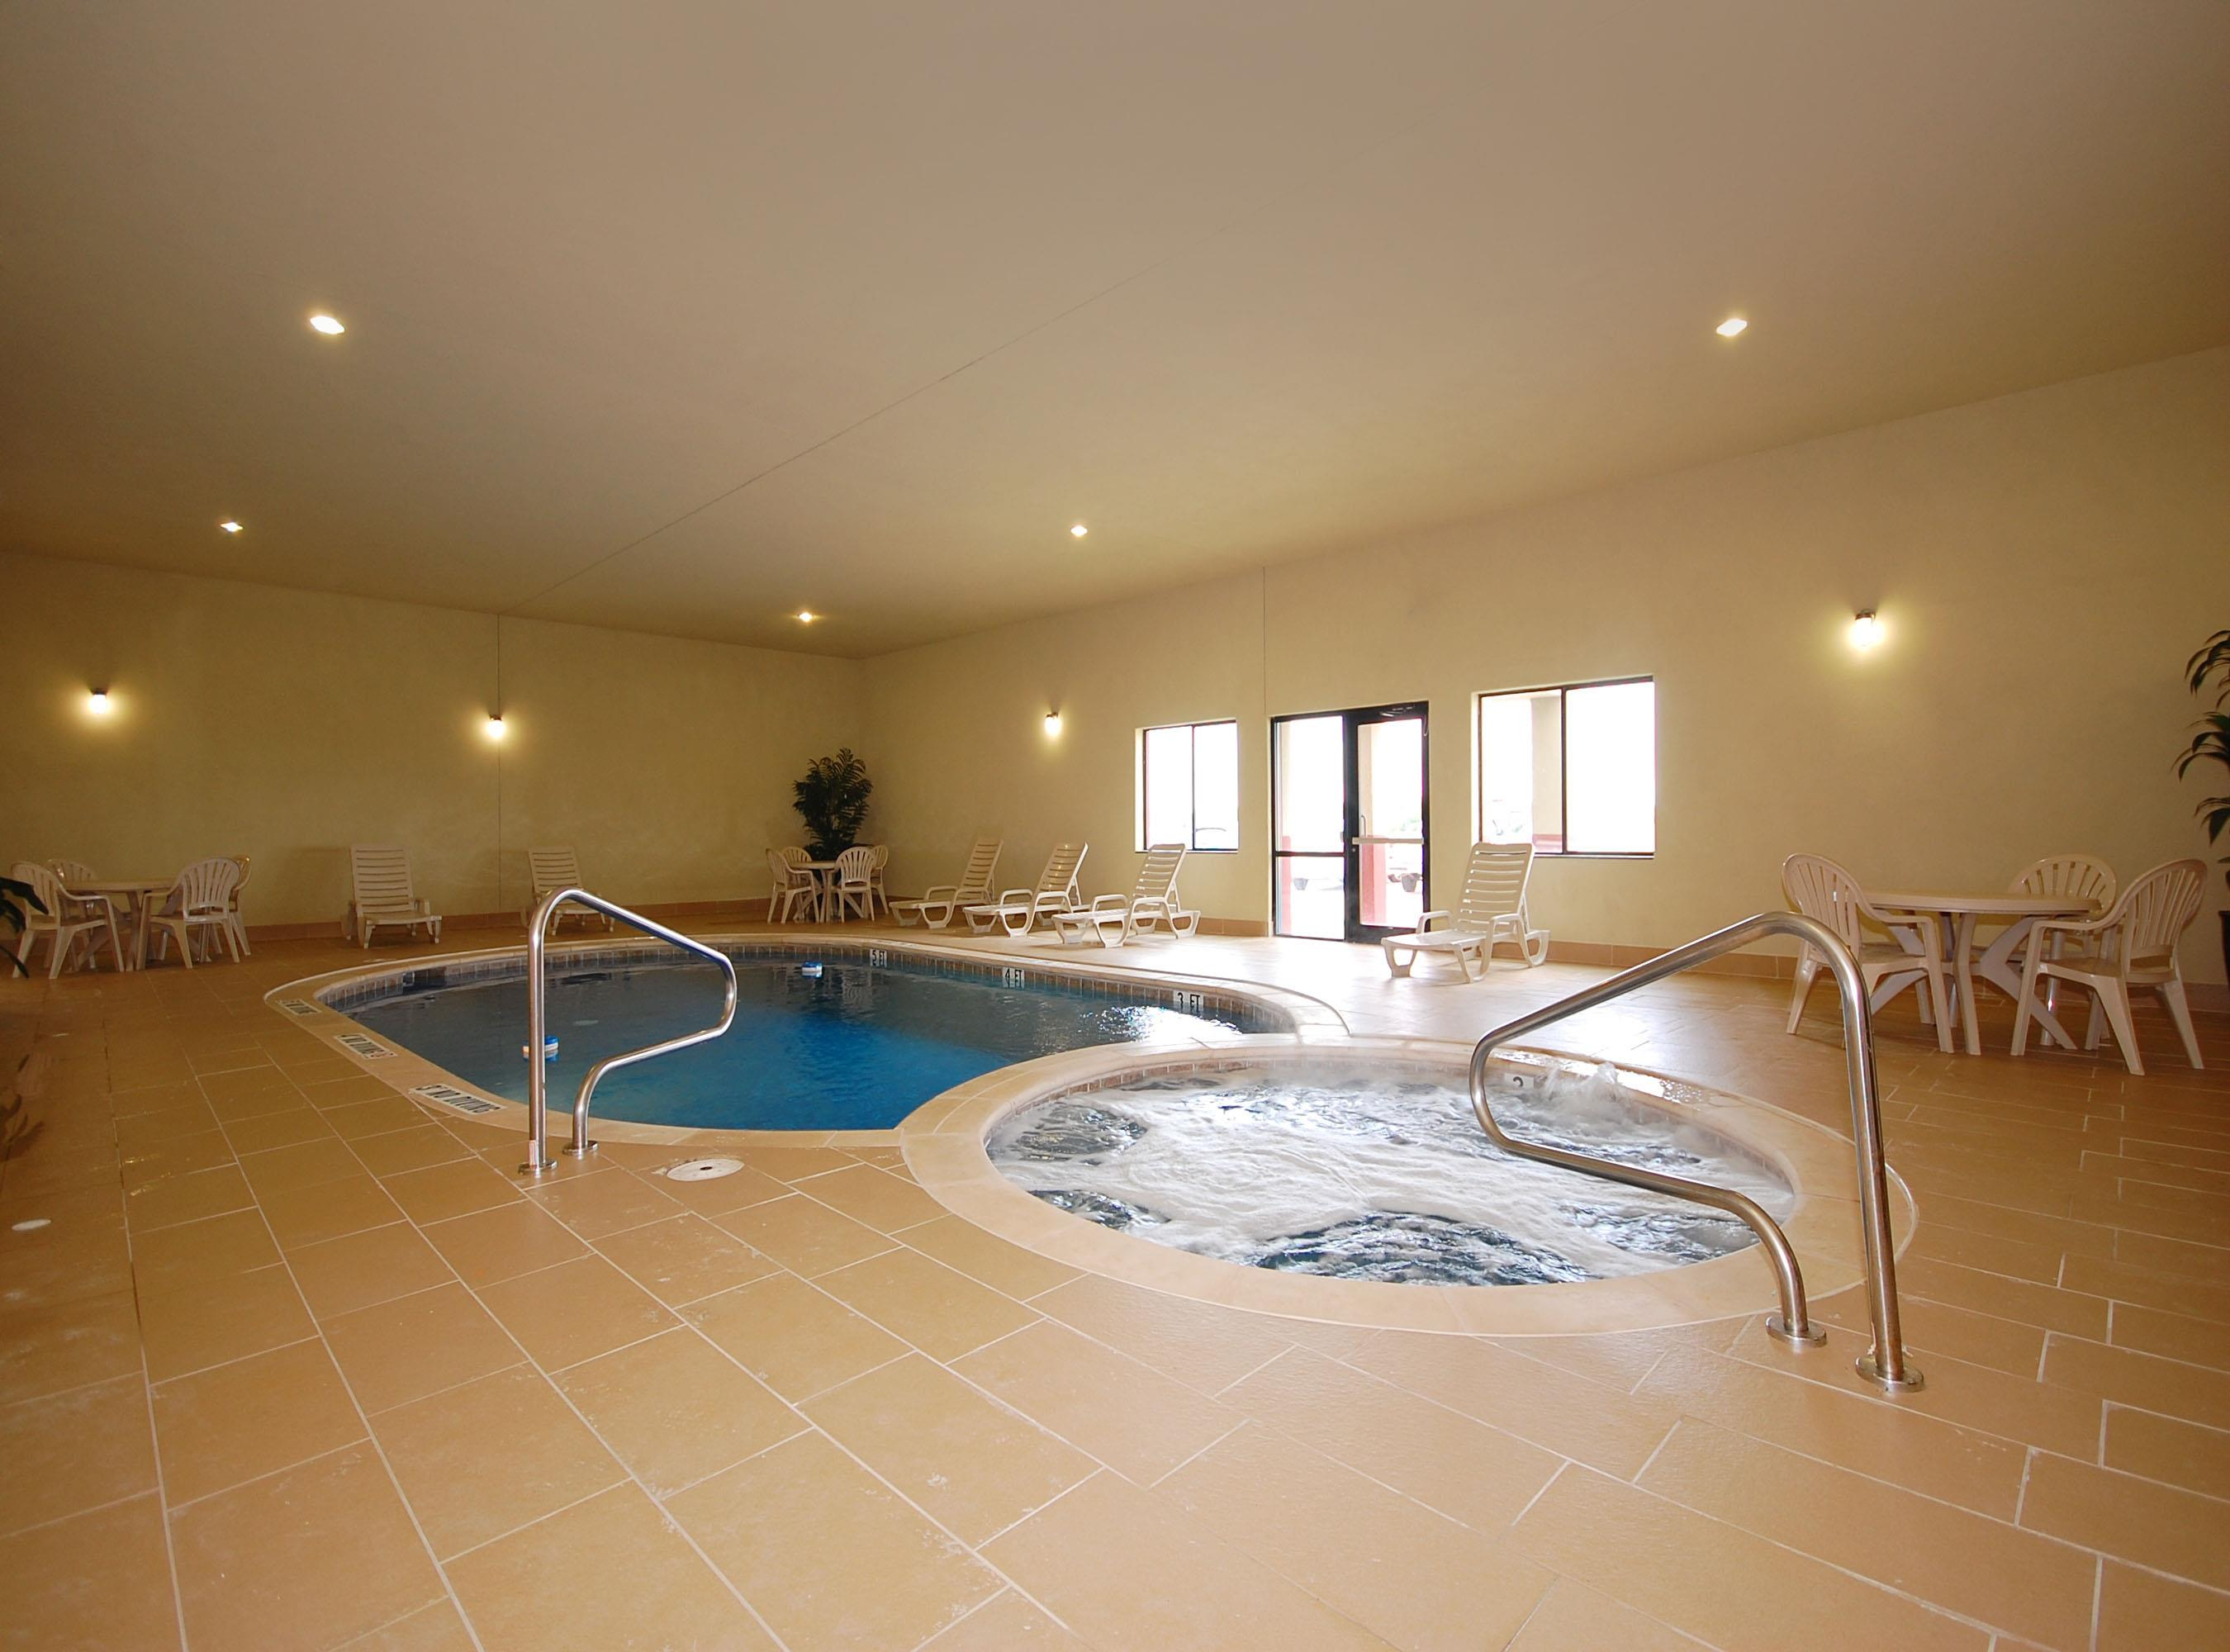 Best Western Plus Texoma Hotel & Suites image 10